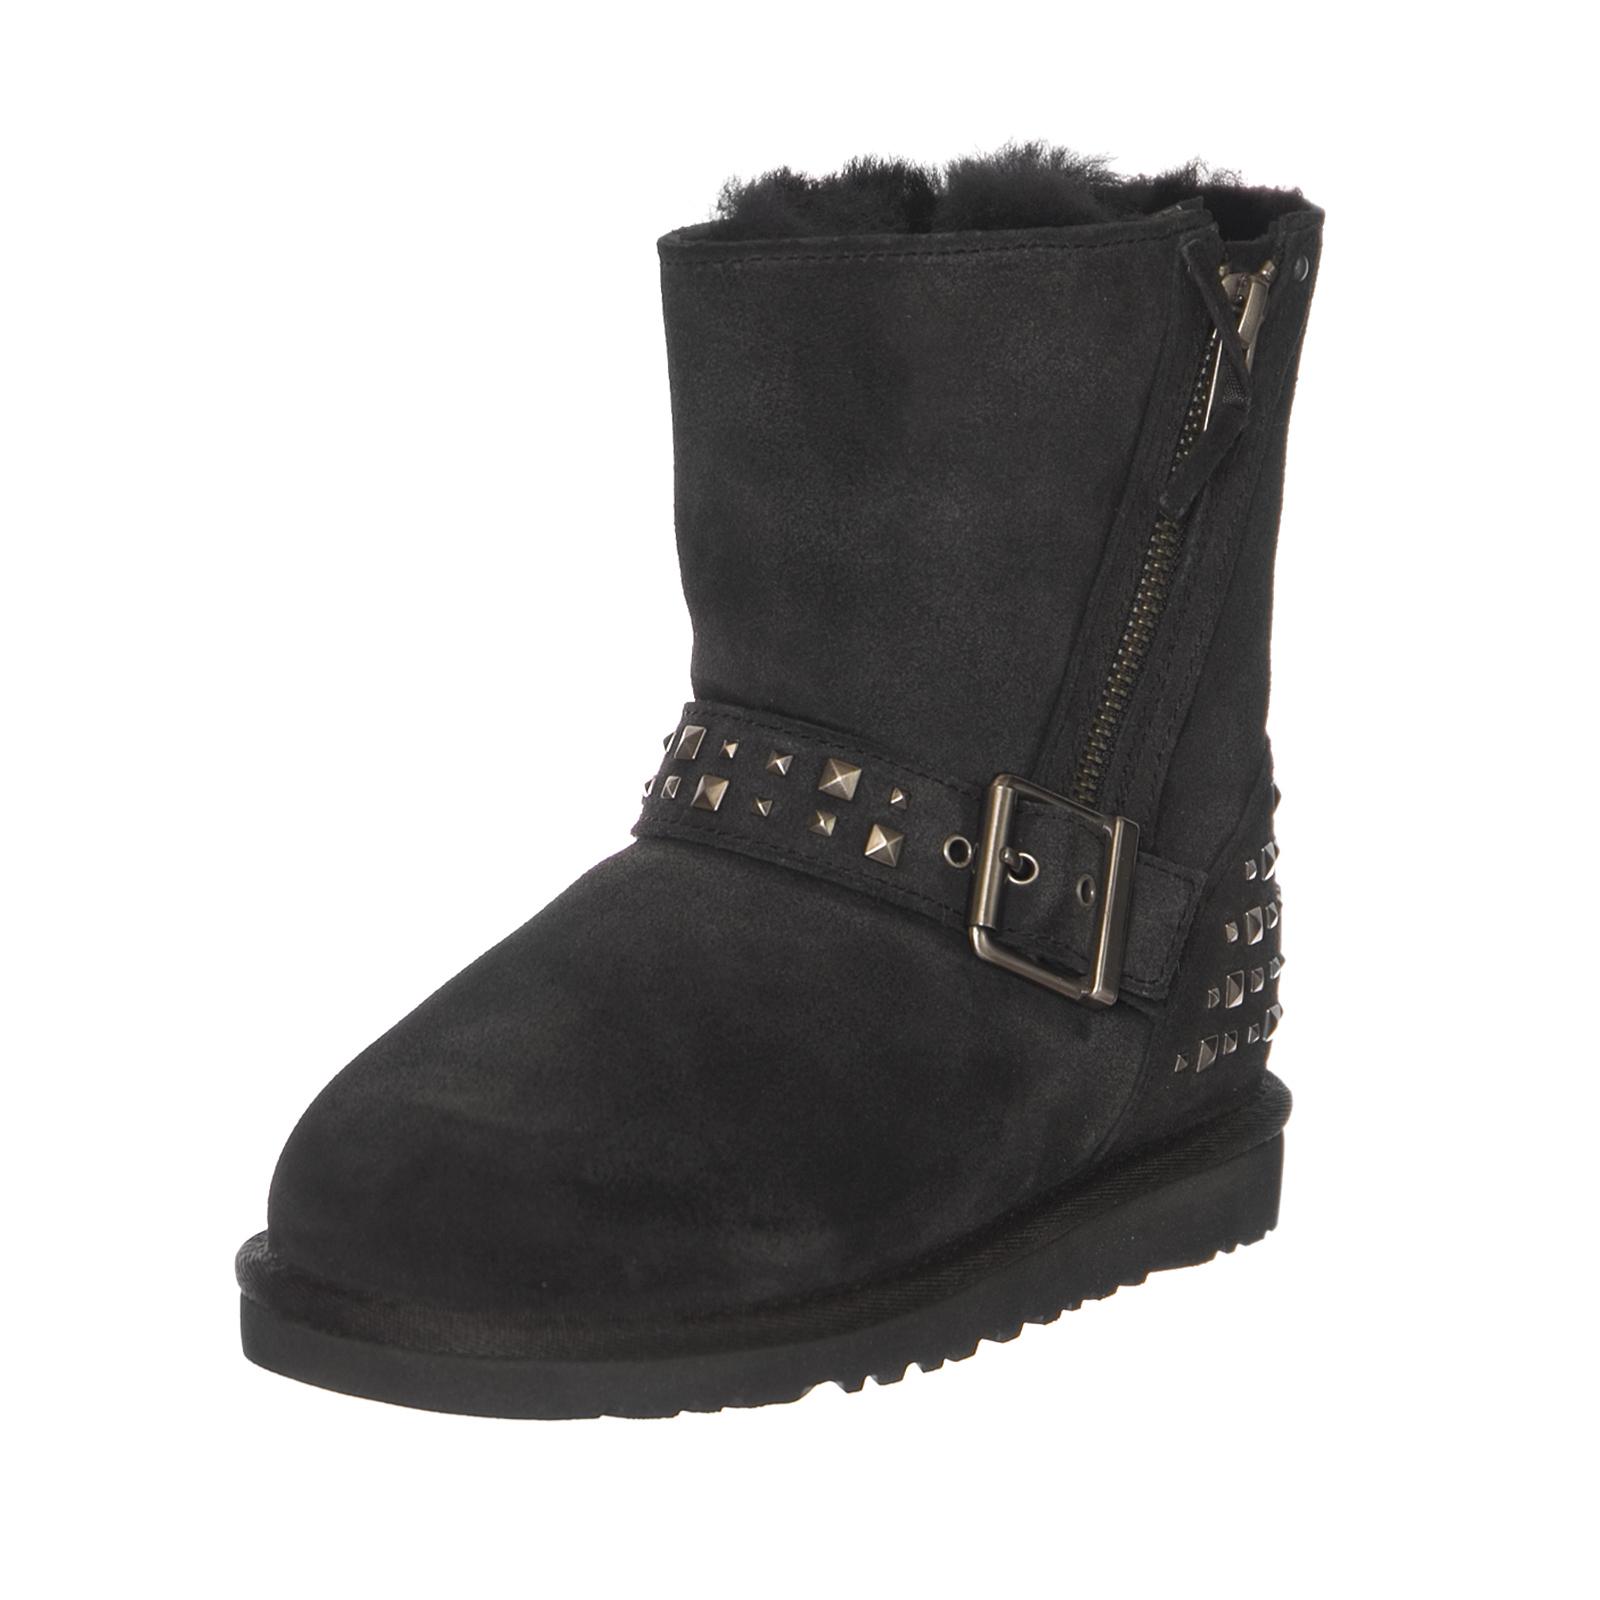 2e35305642d79 Ugg Boots Blaise Studs Black K Black